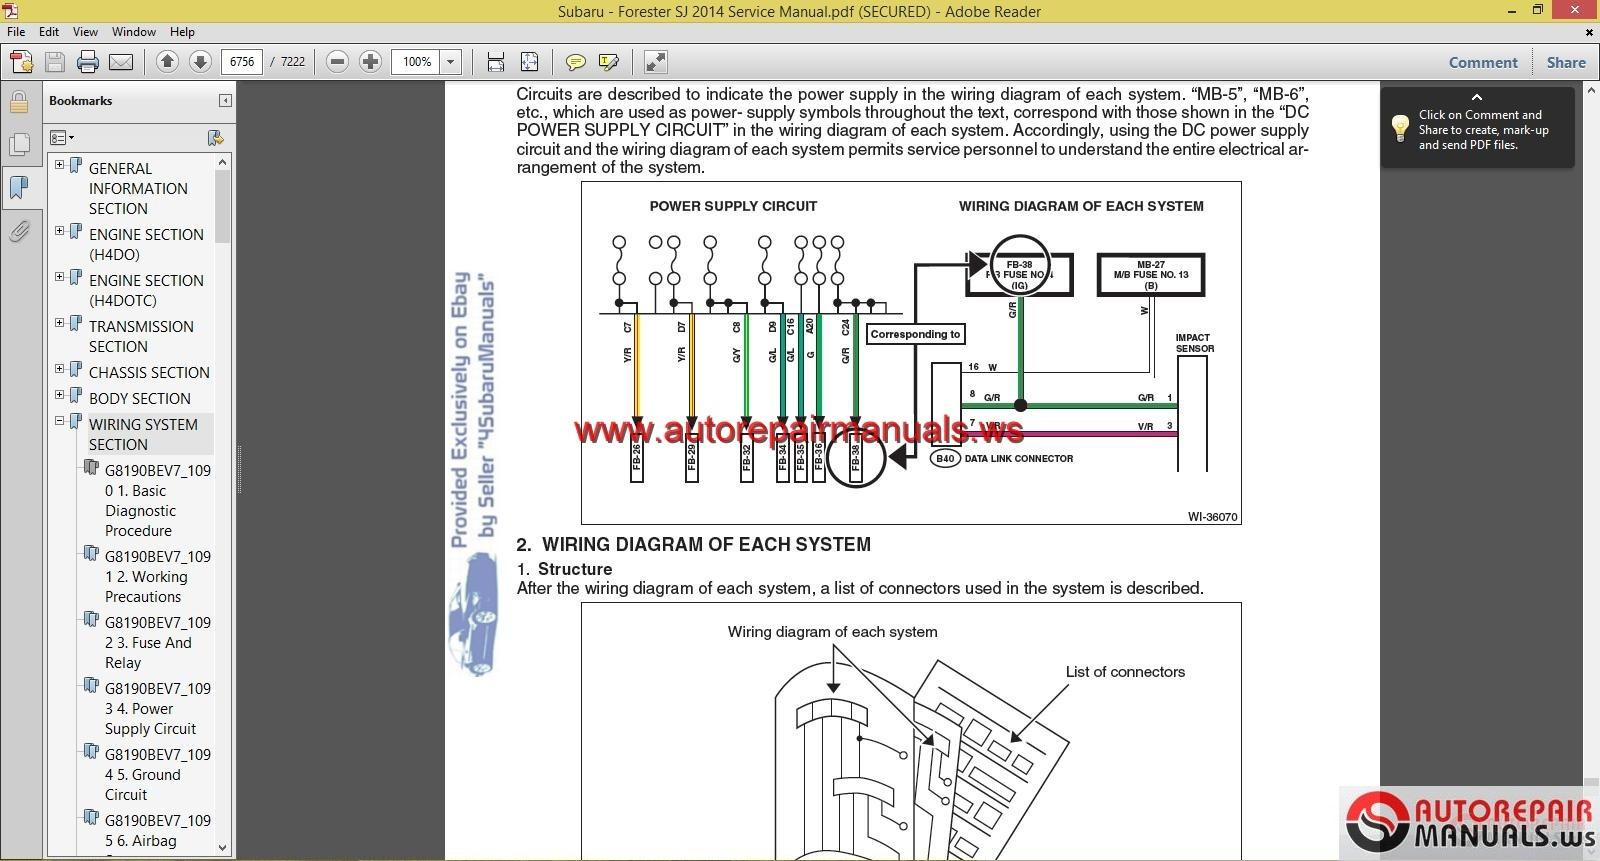 2009 Subaru Forester Wiring Diagram Subaru Forester I Need The